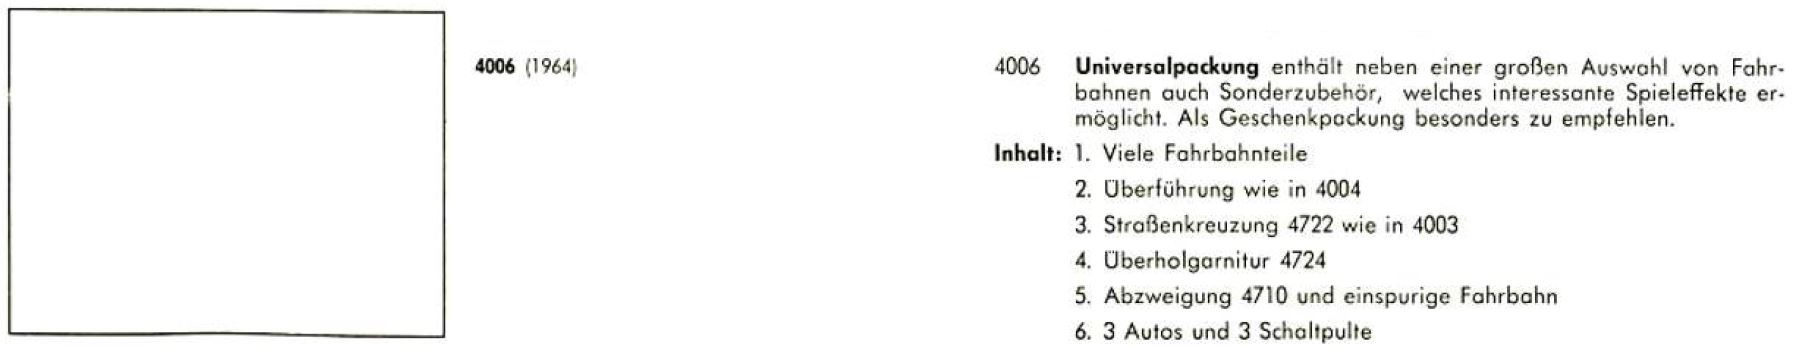 006-851d-teil-1